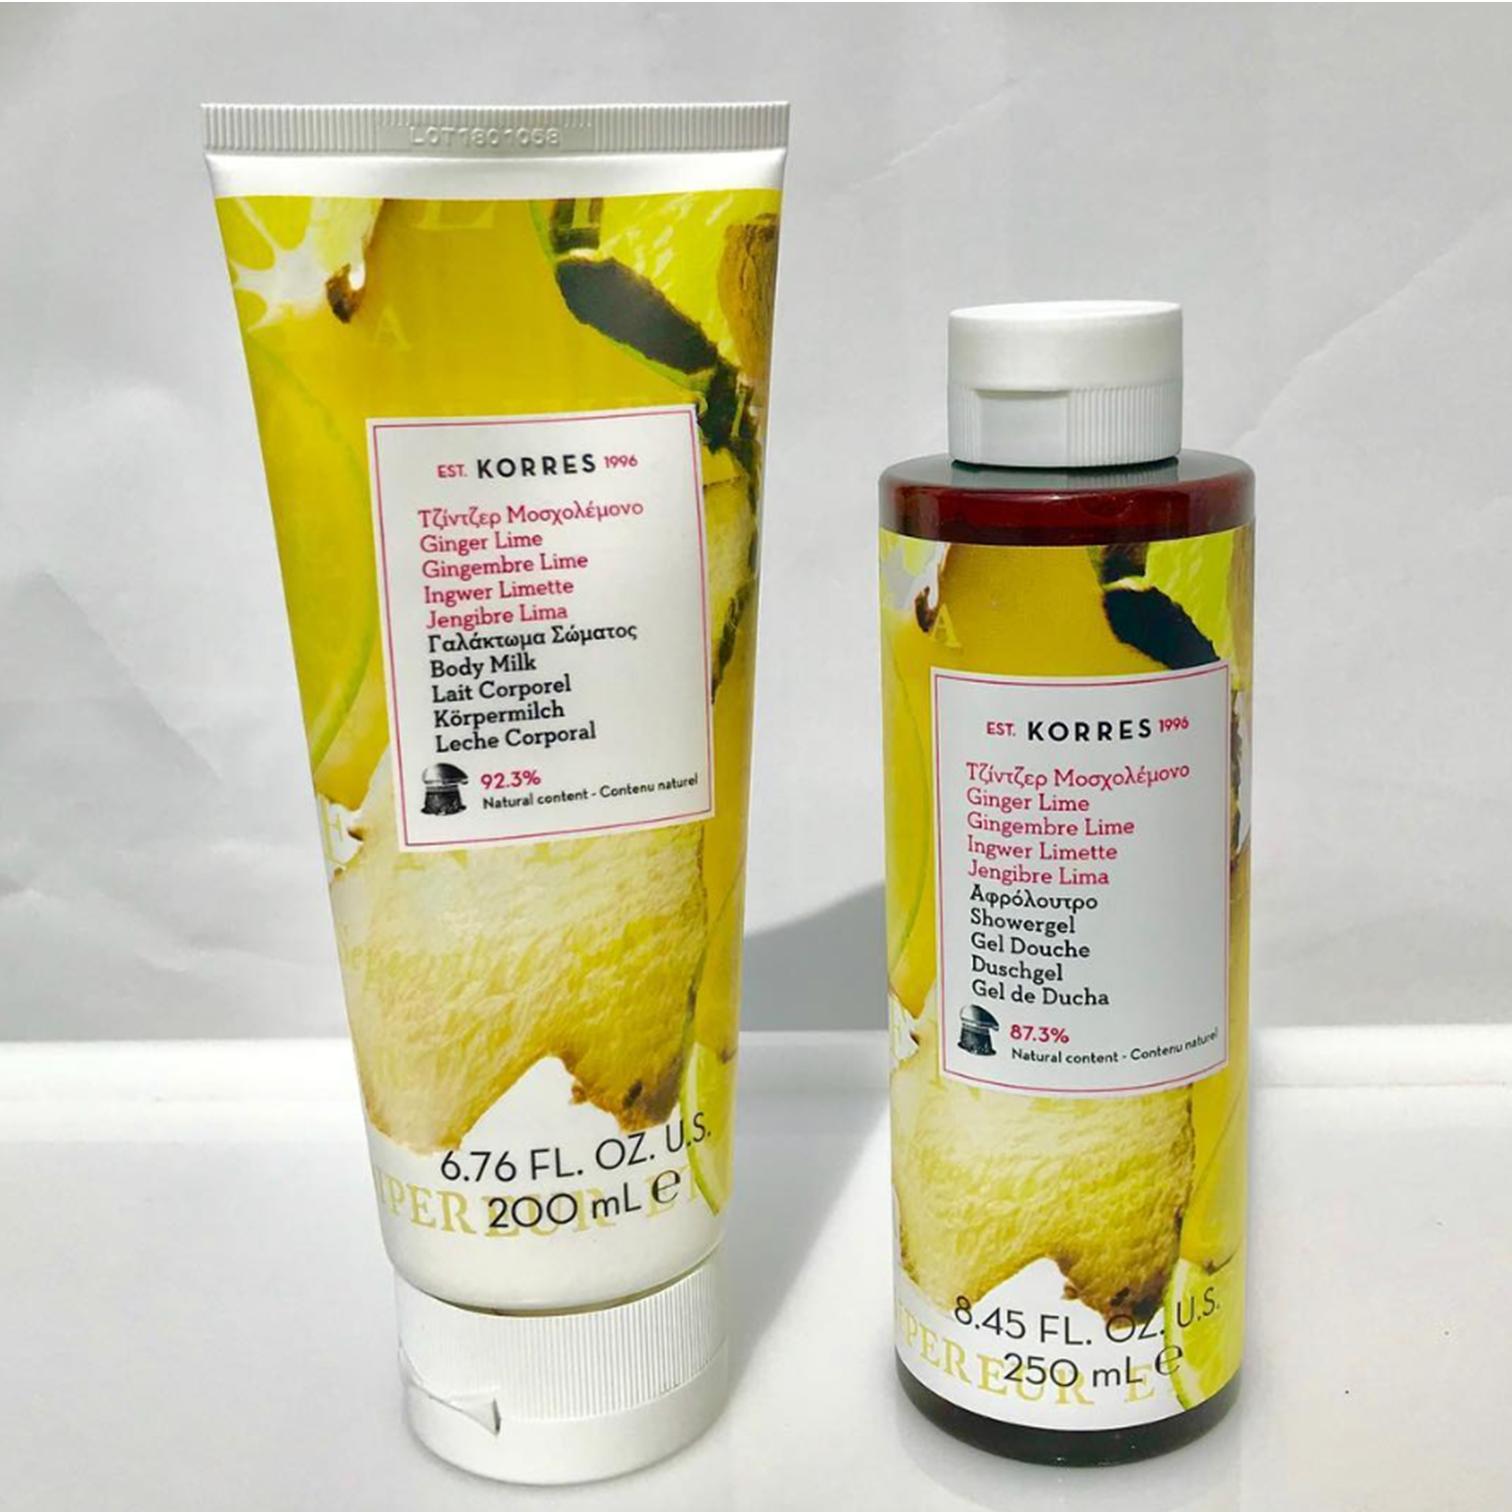 Ginger Lime Showerge + Bodymilk